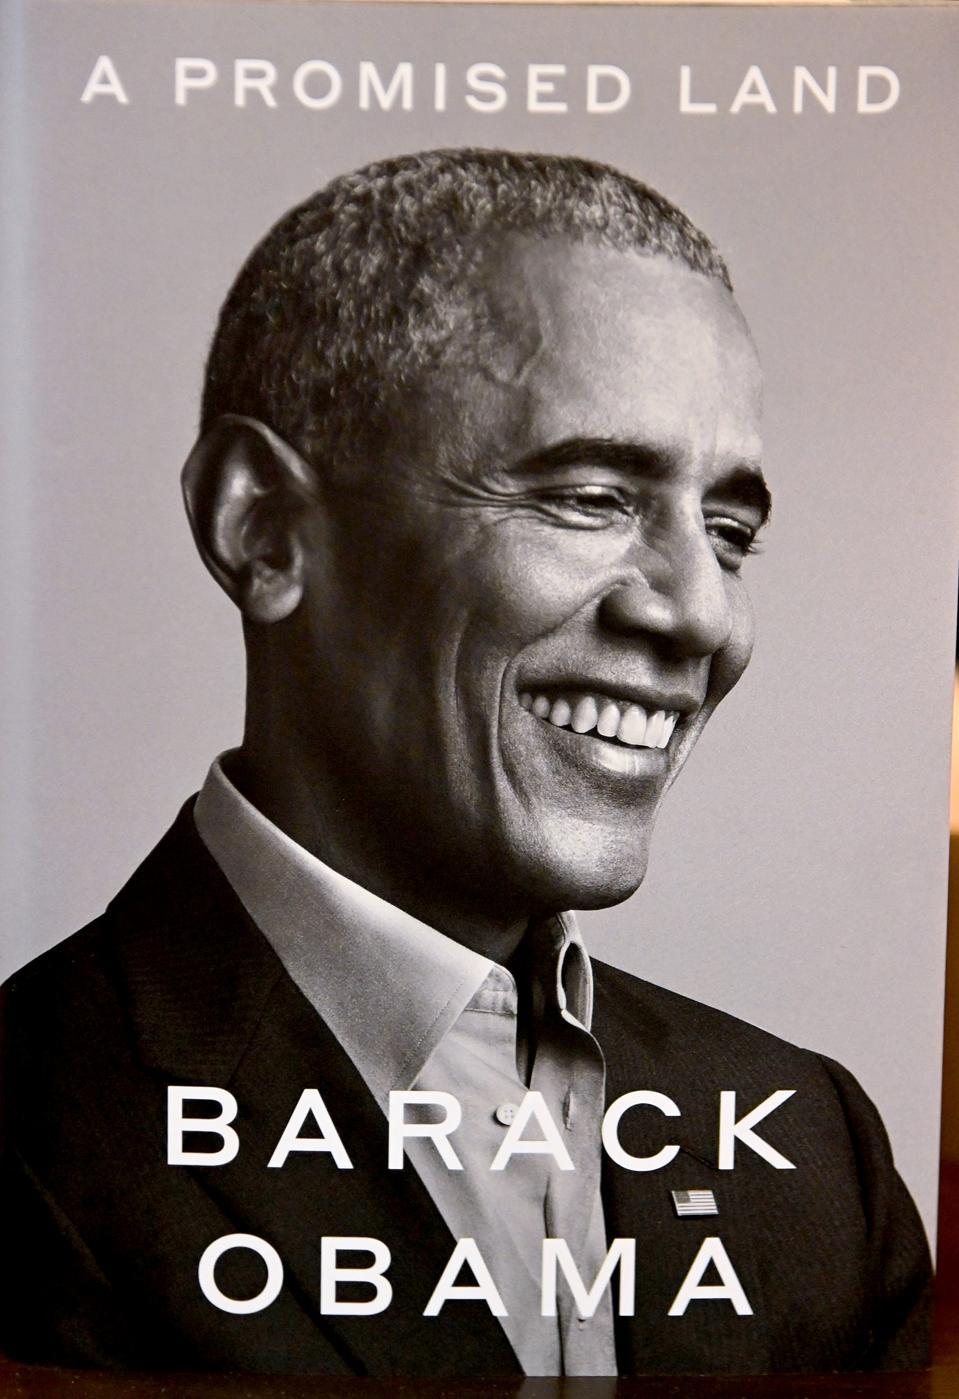 President Barack Obama's Memoir ″A Promised Land″ Goes On Sale Ahead Of Holiday Season